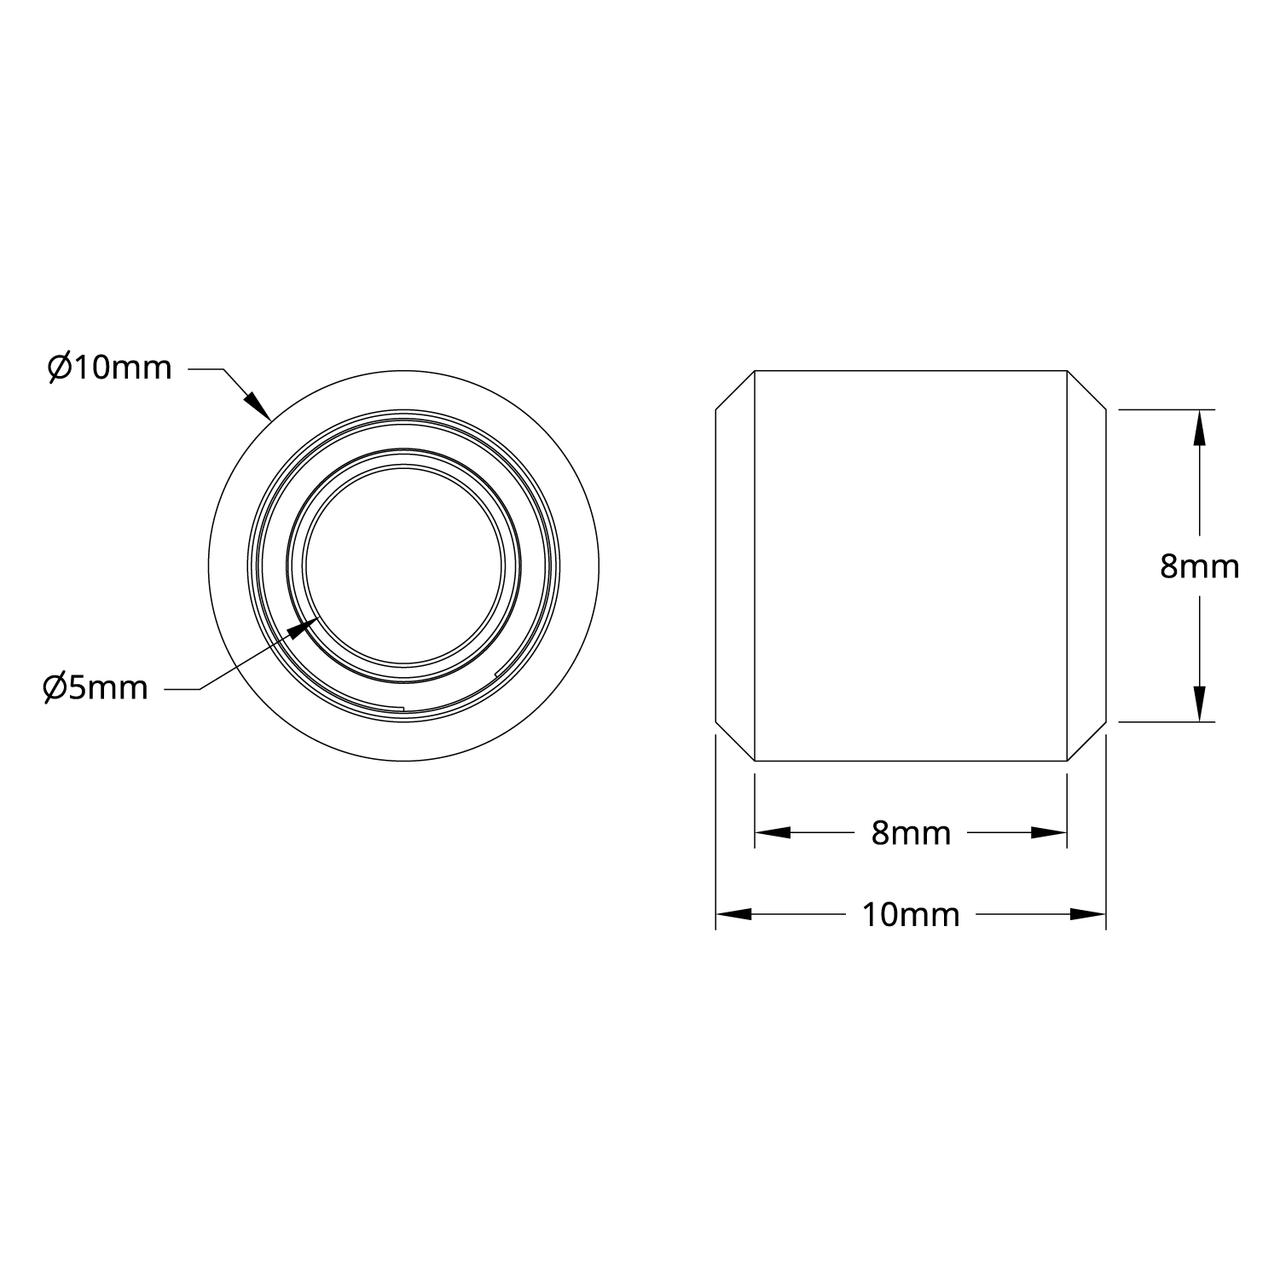 hight resolution of  10mm 3600 0005 1010 schematic